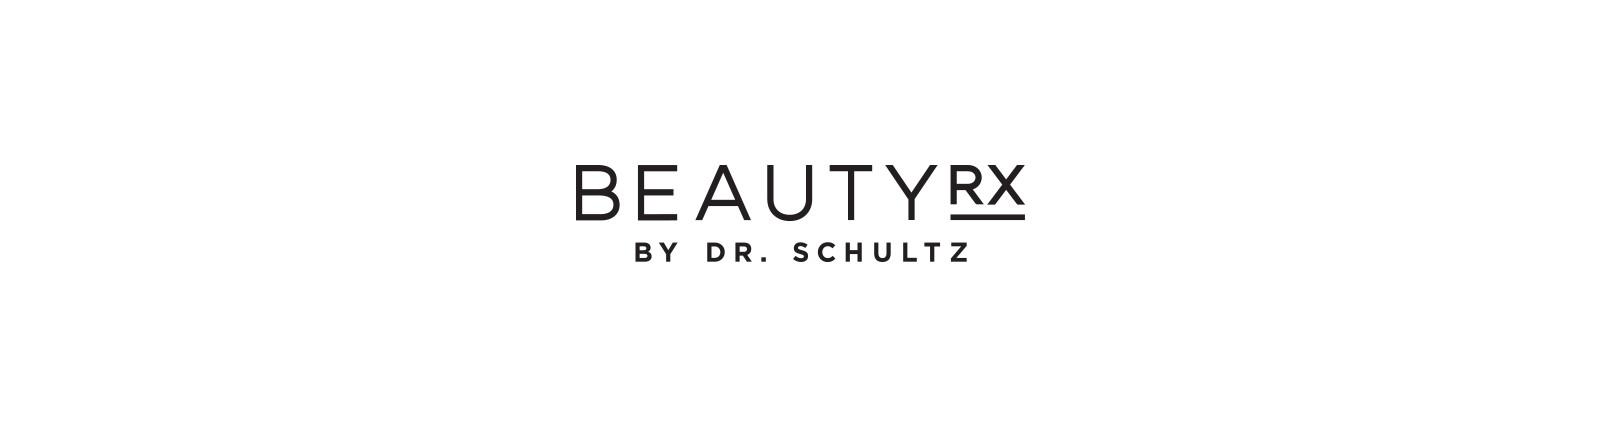 brx-logo